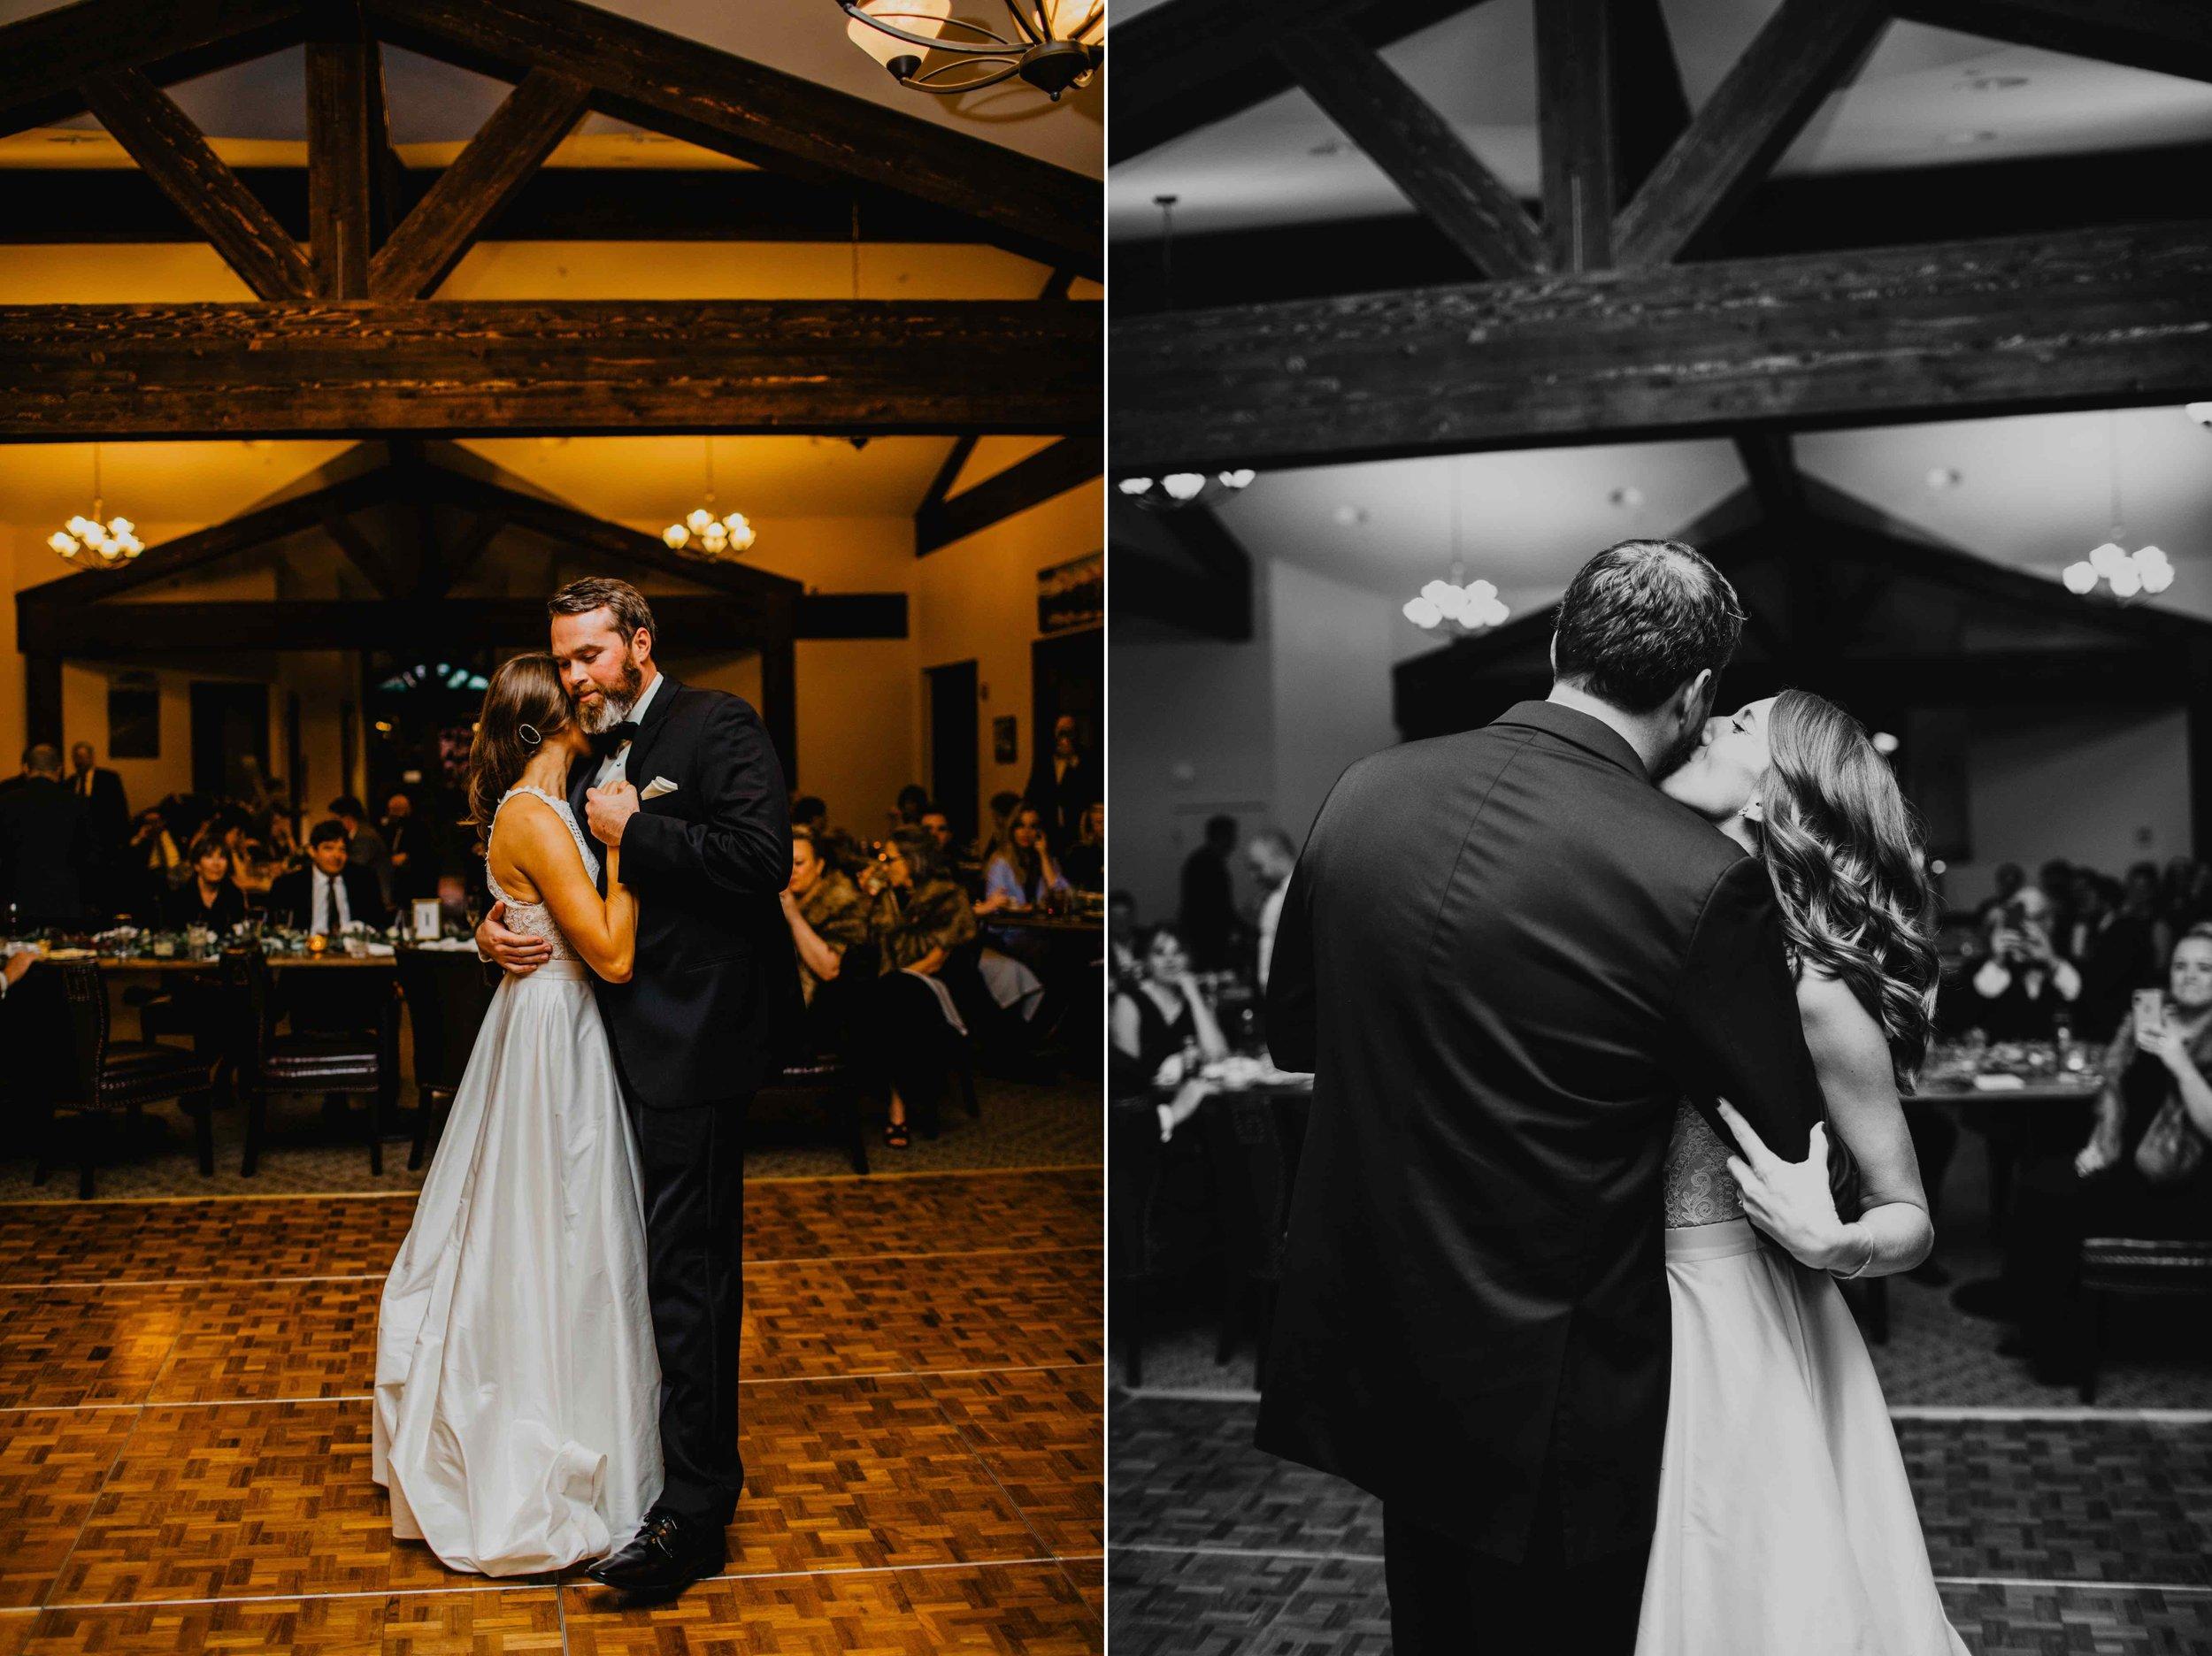 Kisa Conrad Favorites-0053-colorado-wedding-photographer-denver-springs-vailhotel-glenwood-springs-colorado-wedding-photographer.jpeg